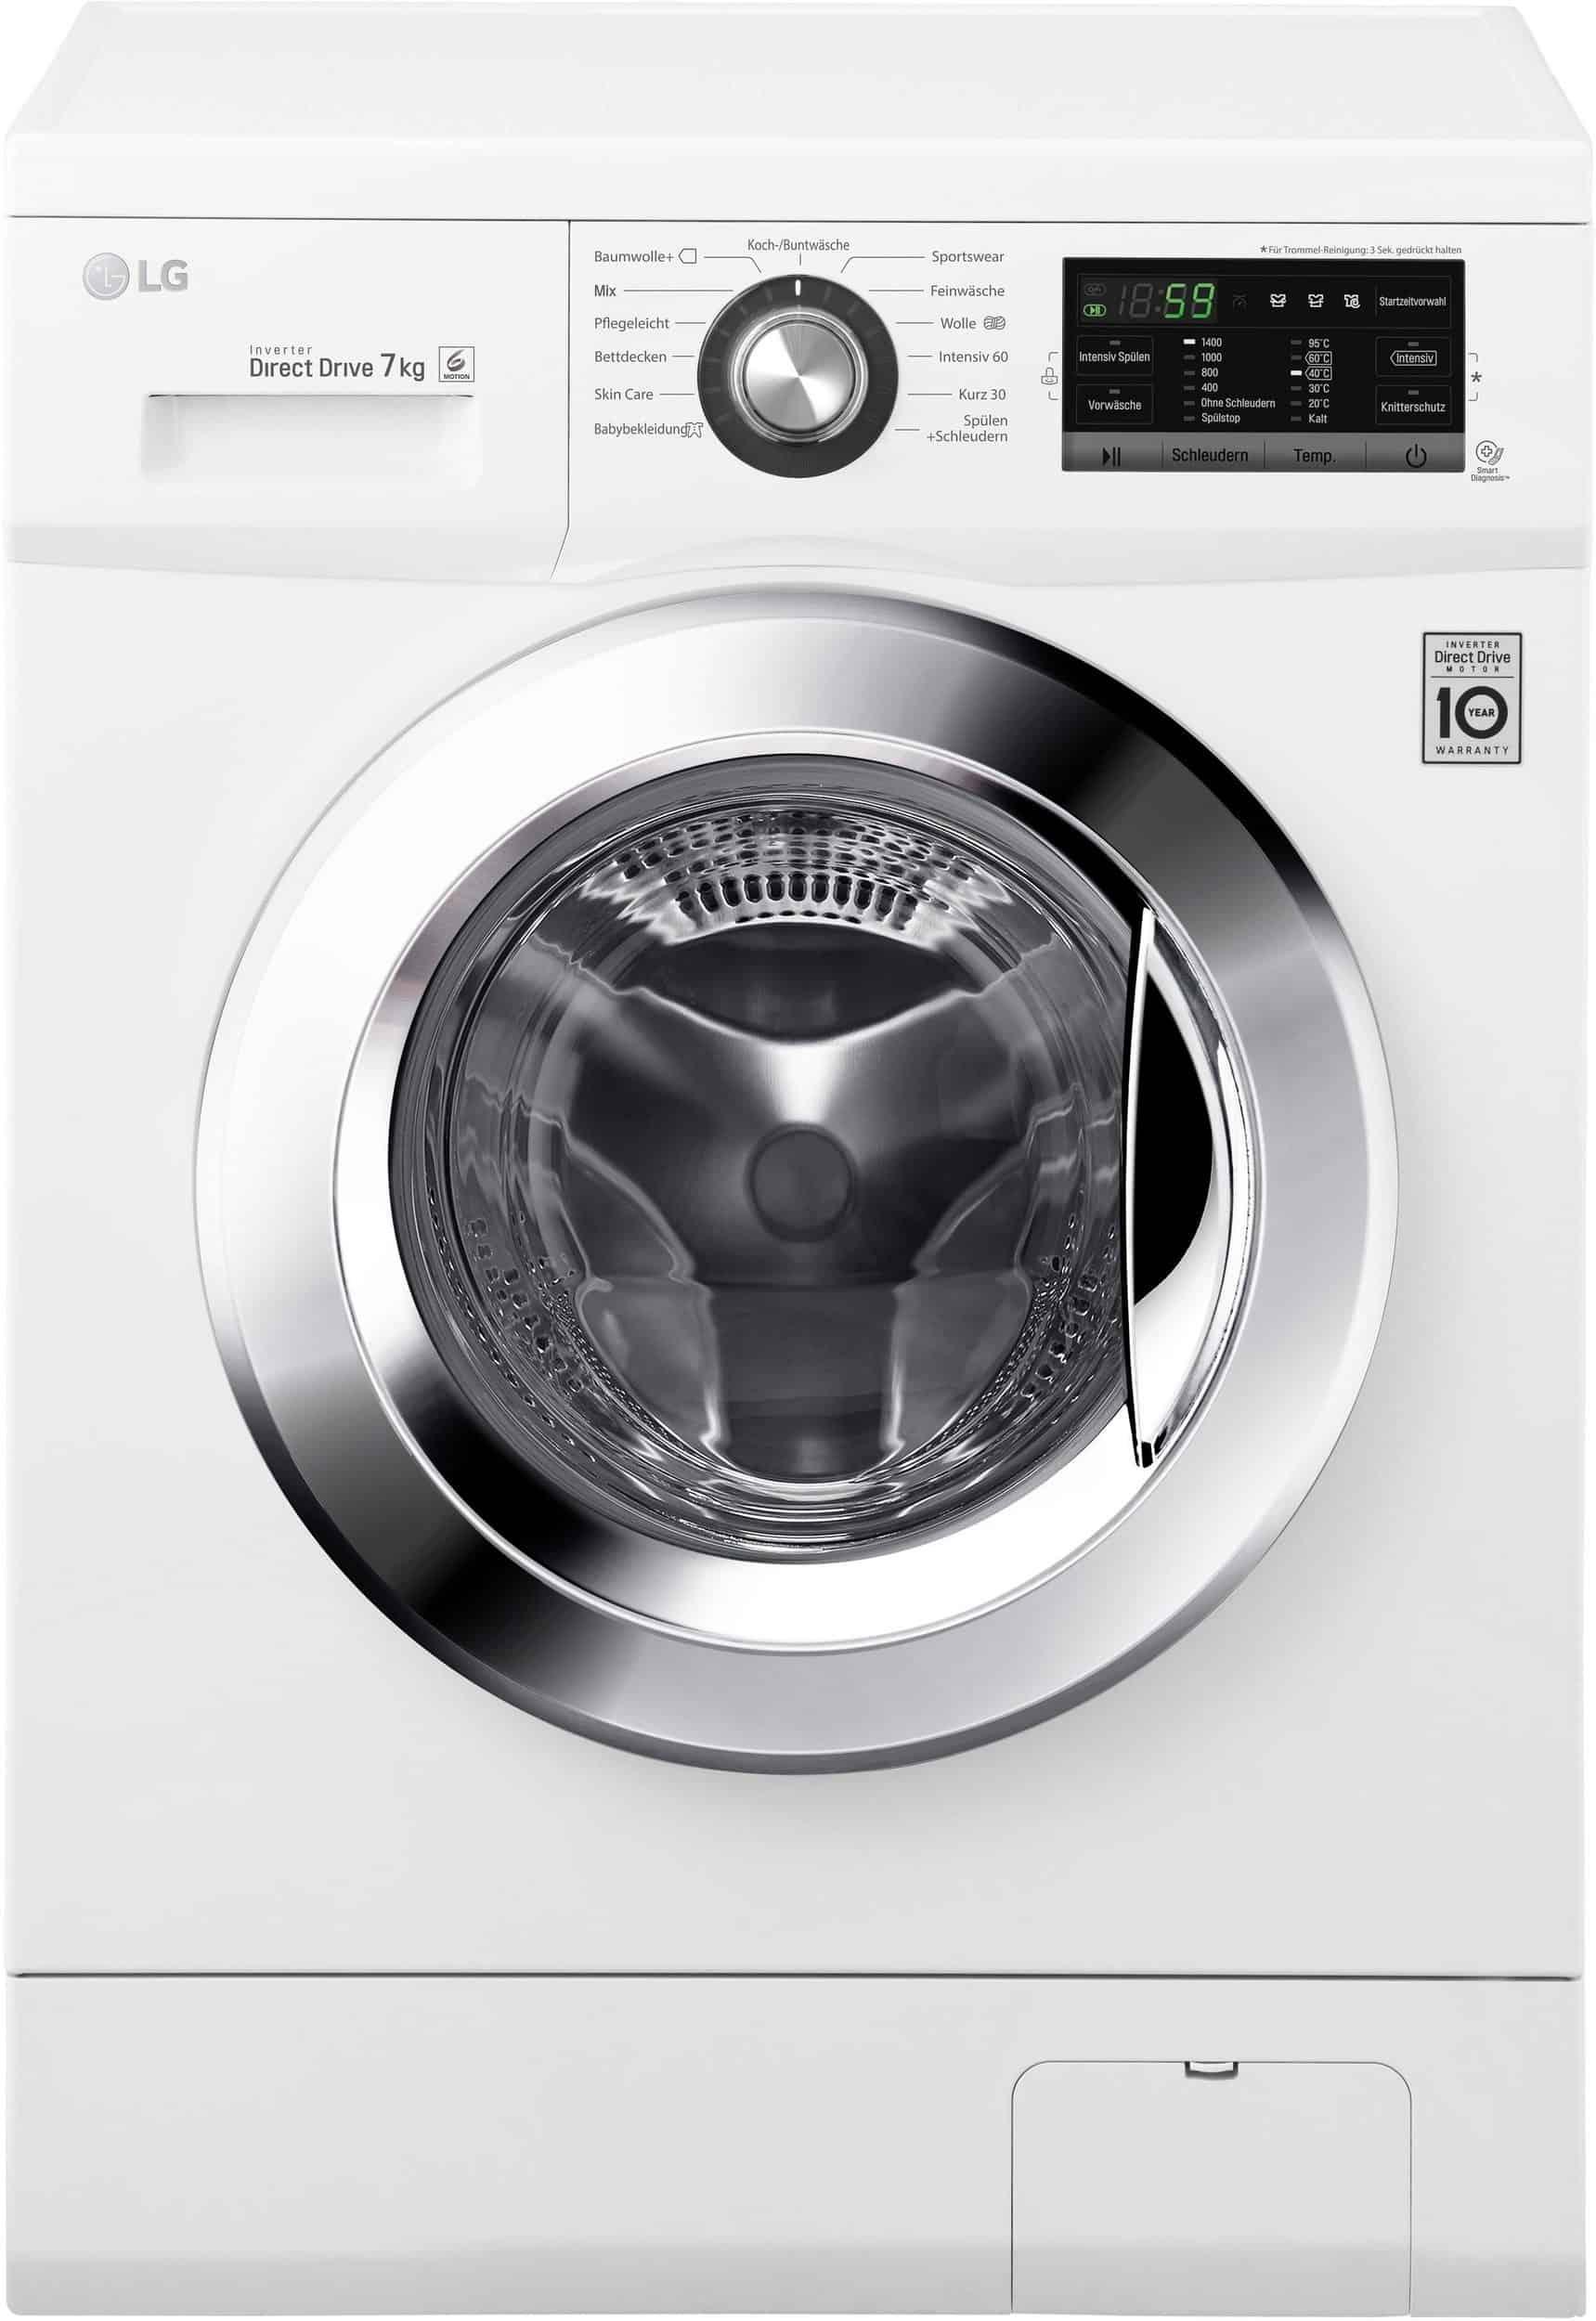 die lg f1496qd3h waschmaschine im test februar 2019. Black Bedroom Furniture Sets. Home Design Ideas